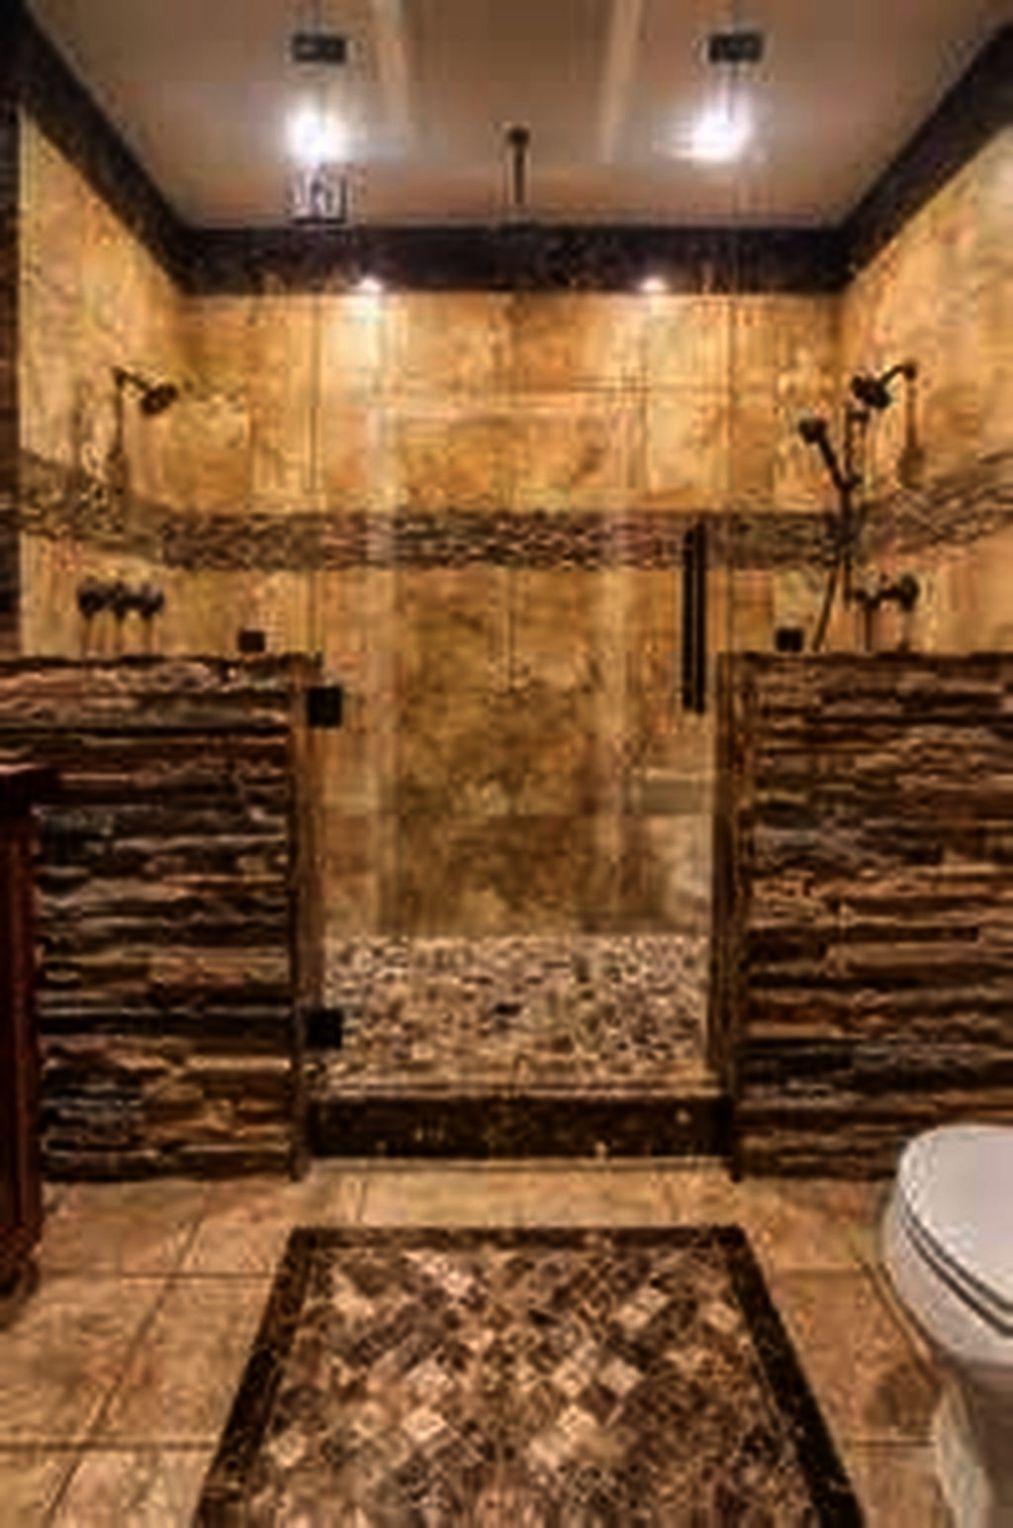 Bathroom Sink Handles Across Bathroom Remodel Help Not Small